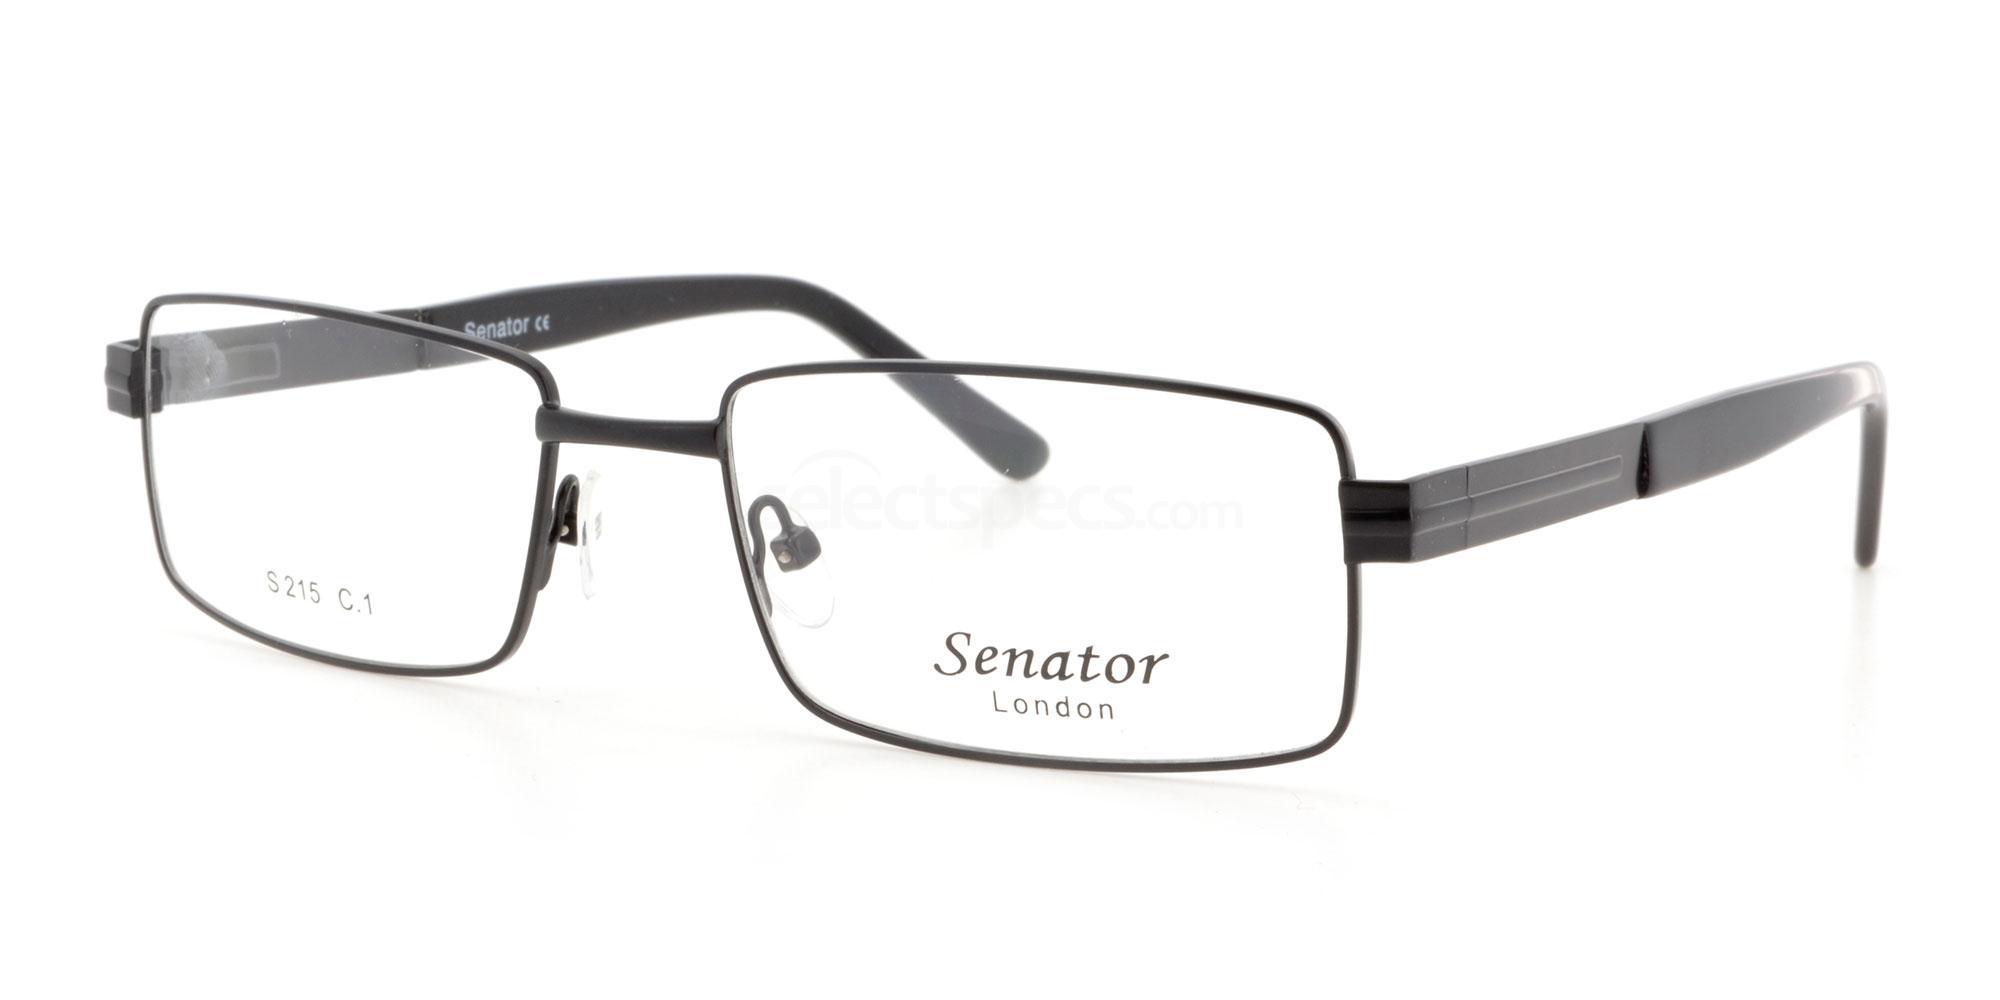 503fb539eba Buy hallmark e9981 glasses free lenses. Shop every store on the ...